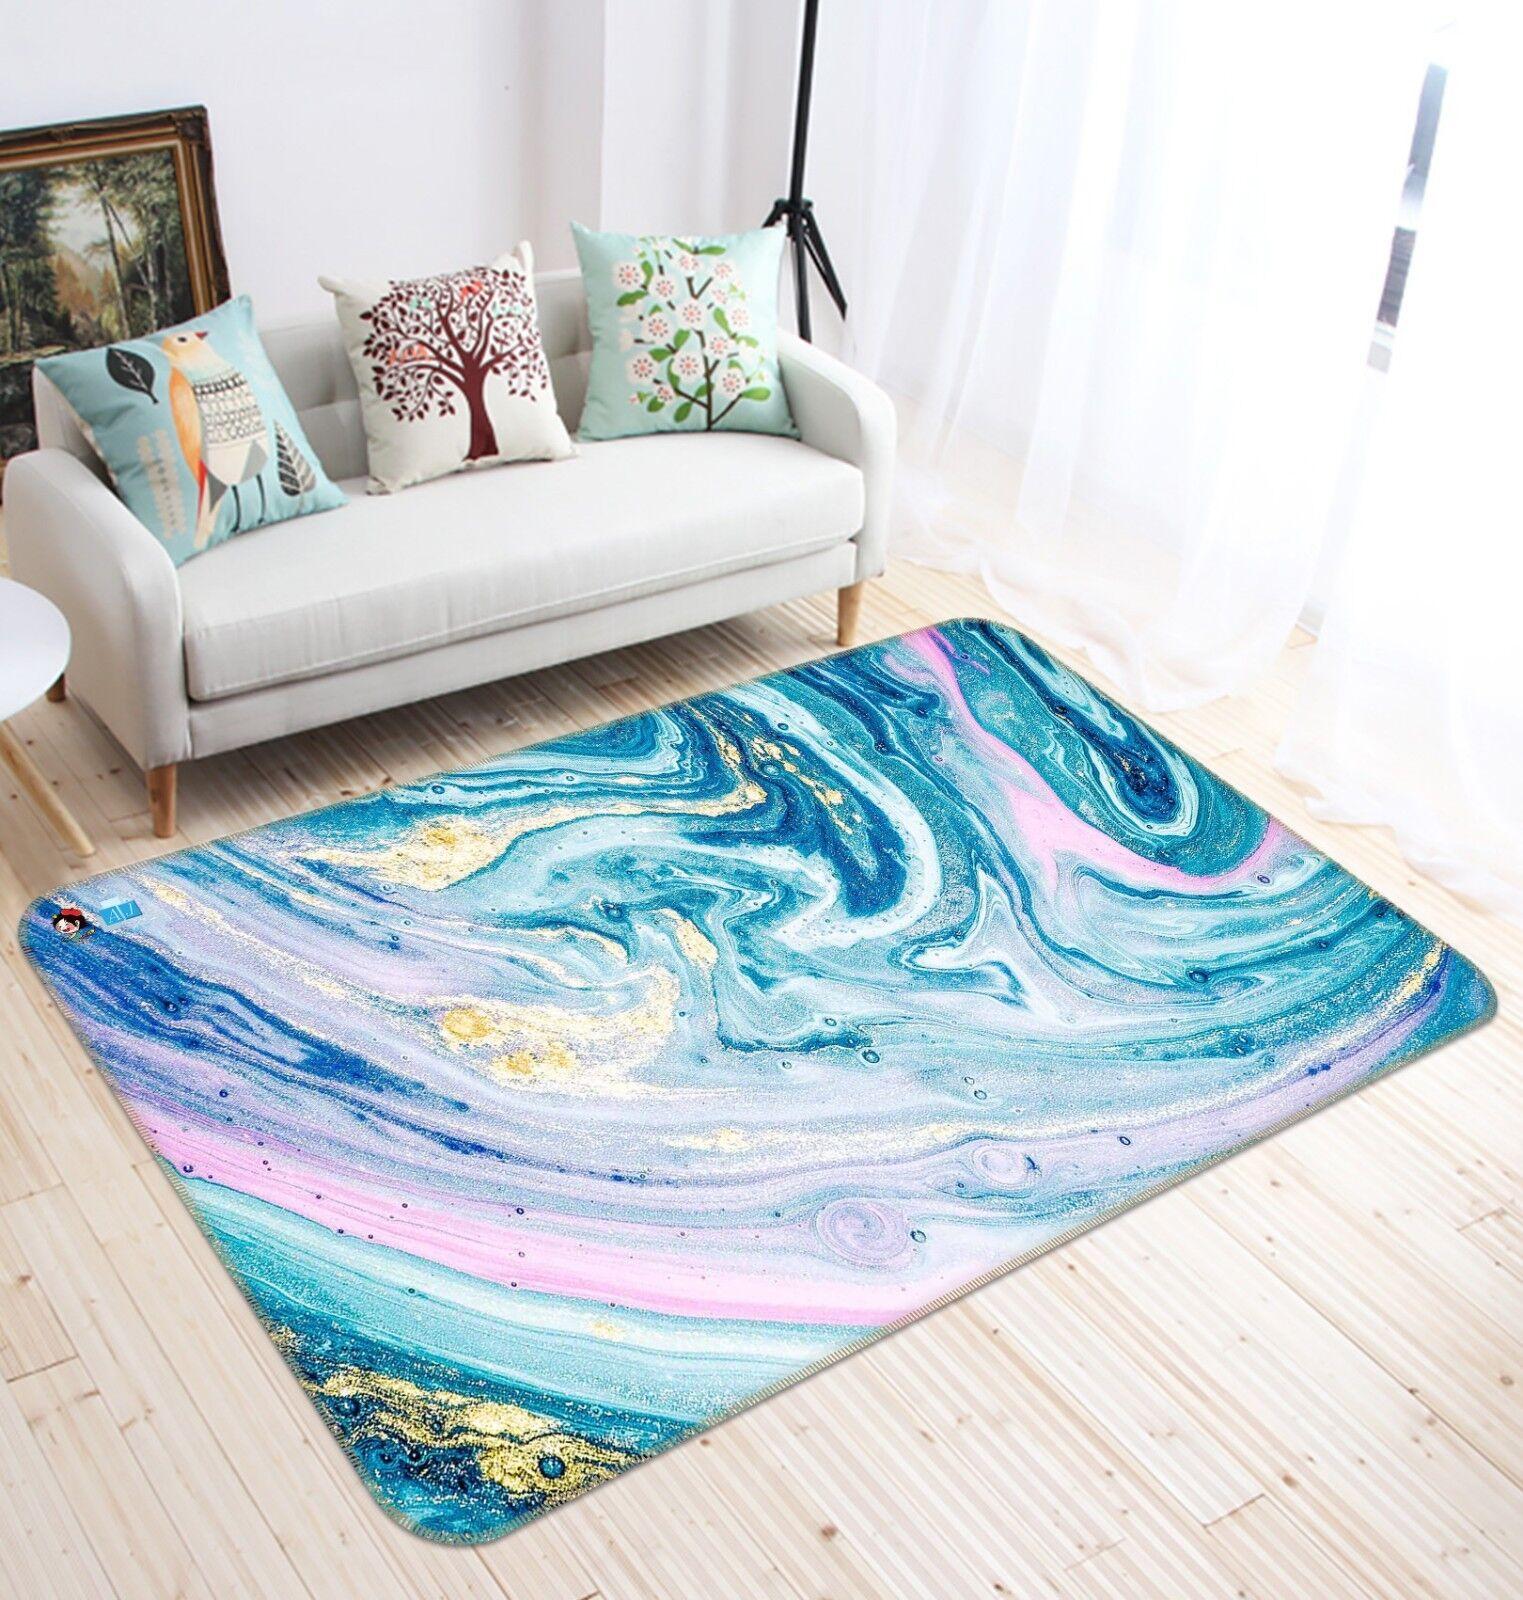 3D Vernice Sunset Beach 88 tappetino antiscivolo tappeto camera Tappetino Qualità Elegante Tappeto foto